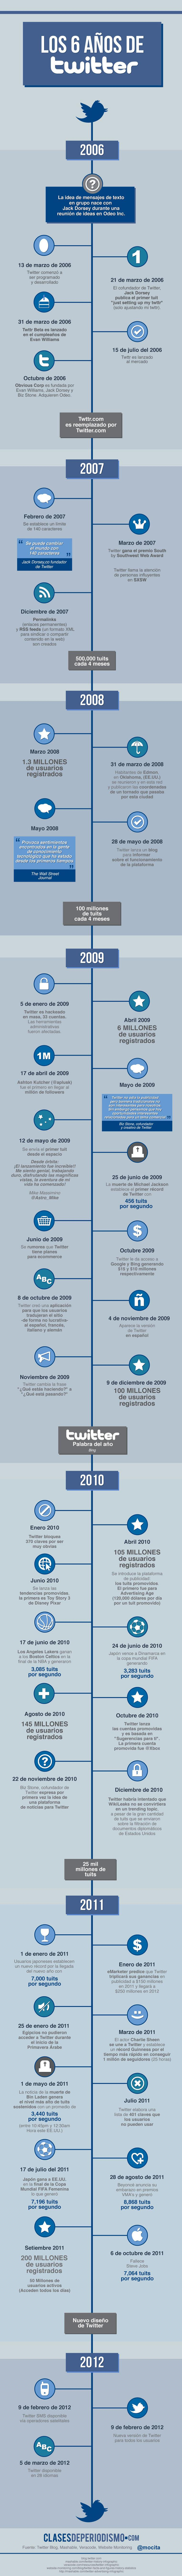 Twitter 6 años